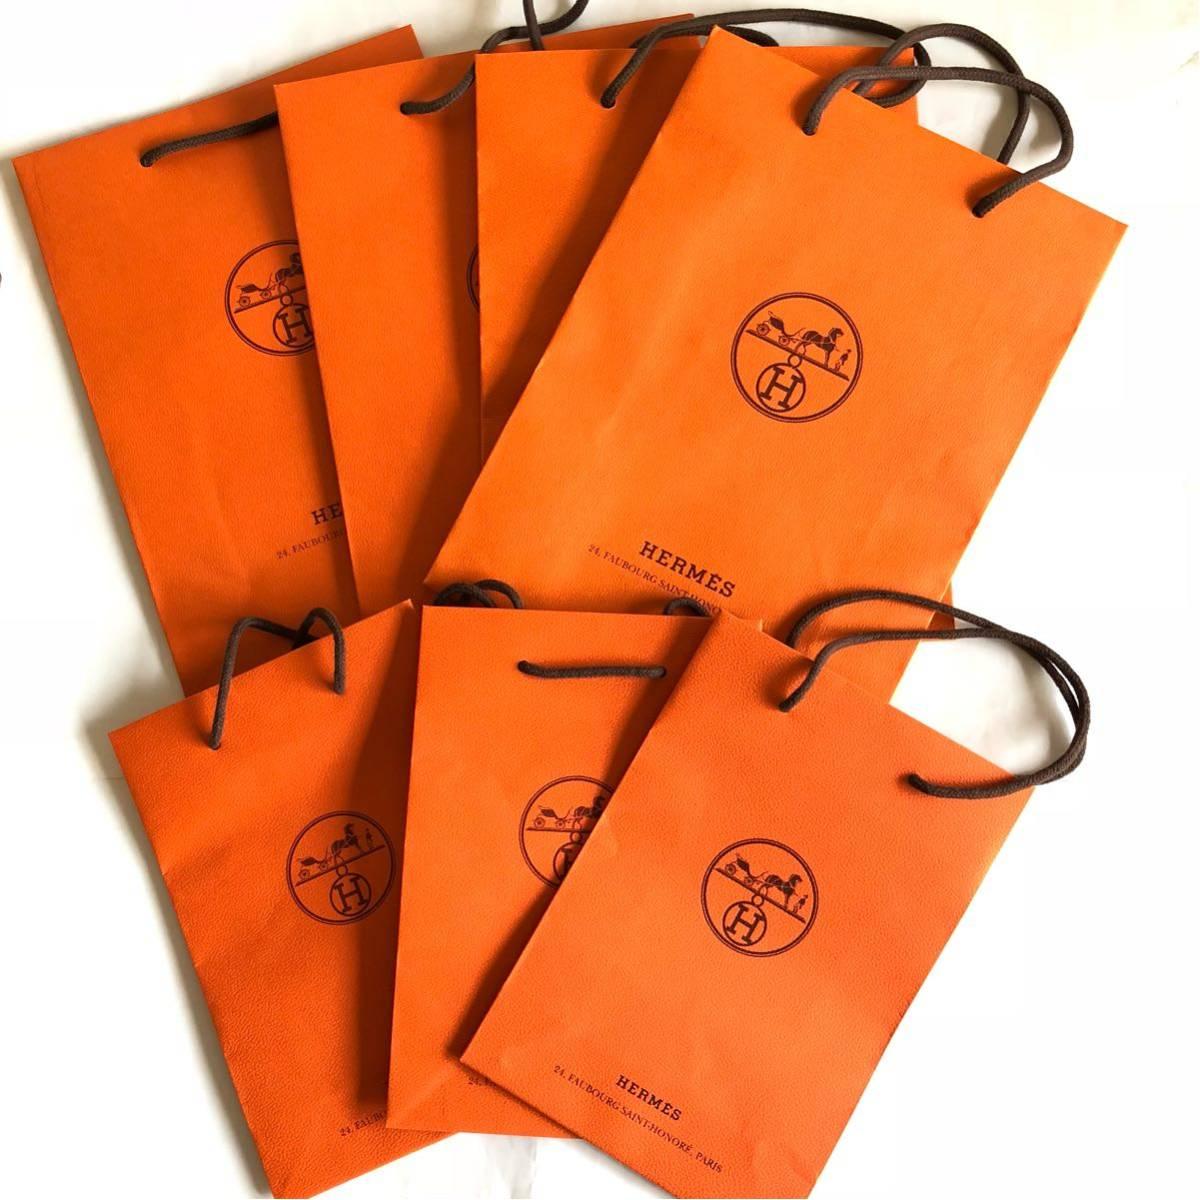 0ce43b8a7c75 エルメス ショップ袋 ショッパー 小3枚中4枚セット オレンジ 紙袋 HERMES